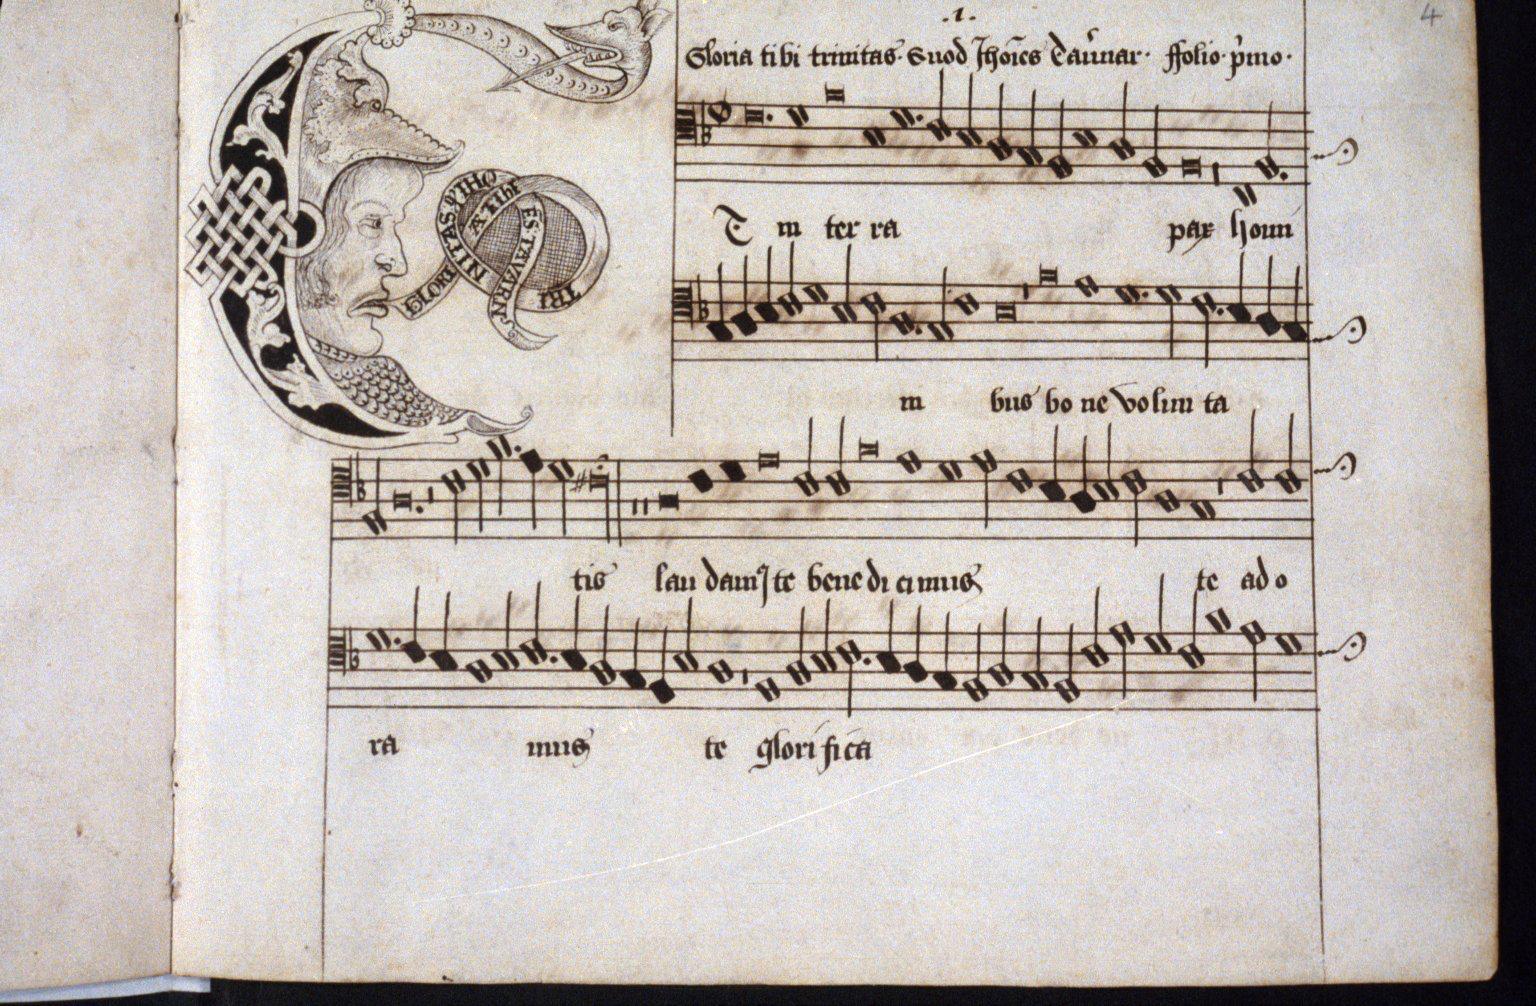 John Taverner Caricatured At The Start Of His Mass Gloria Tibi Trinitas In The Tenor Voice Part Bodleianlibs Mus Sch E John Taverner Caricature The Voice